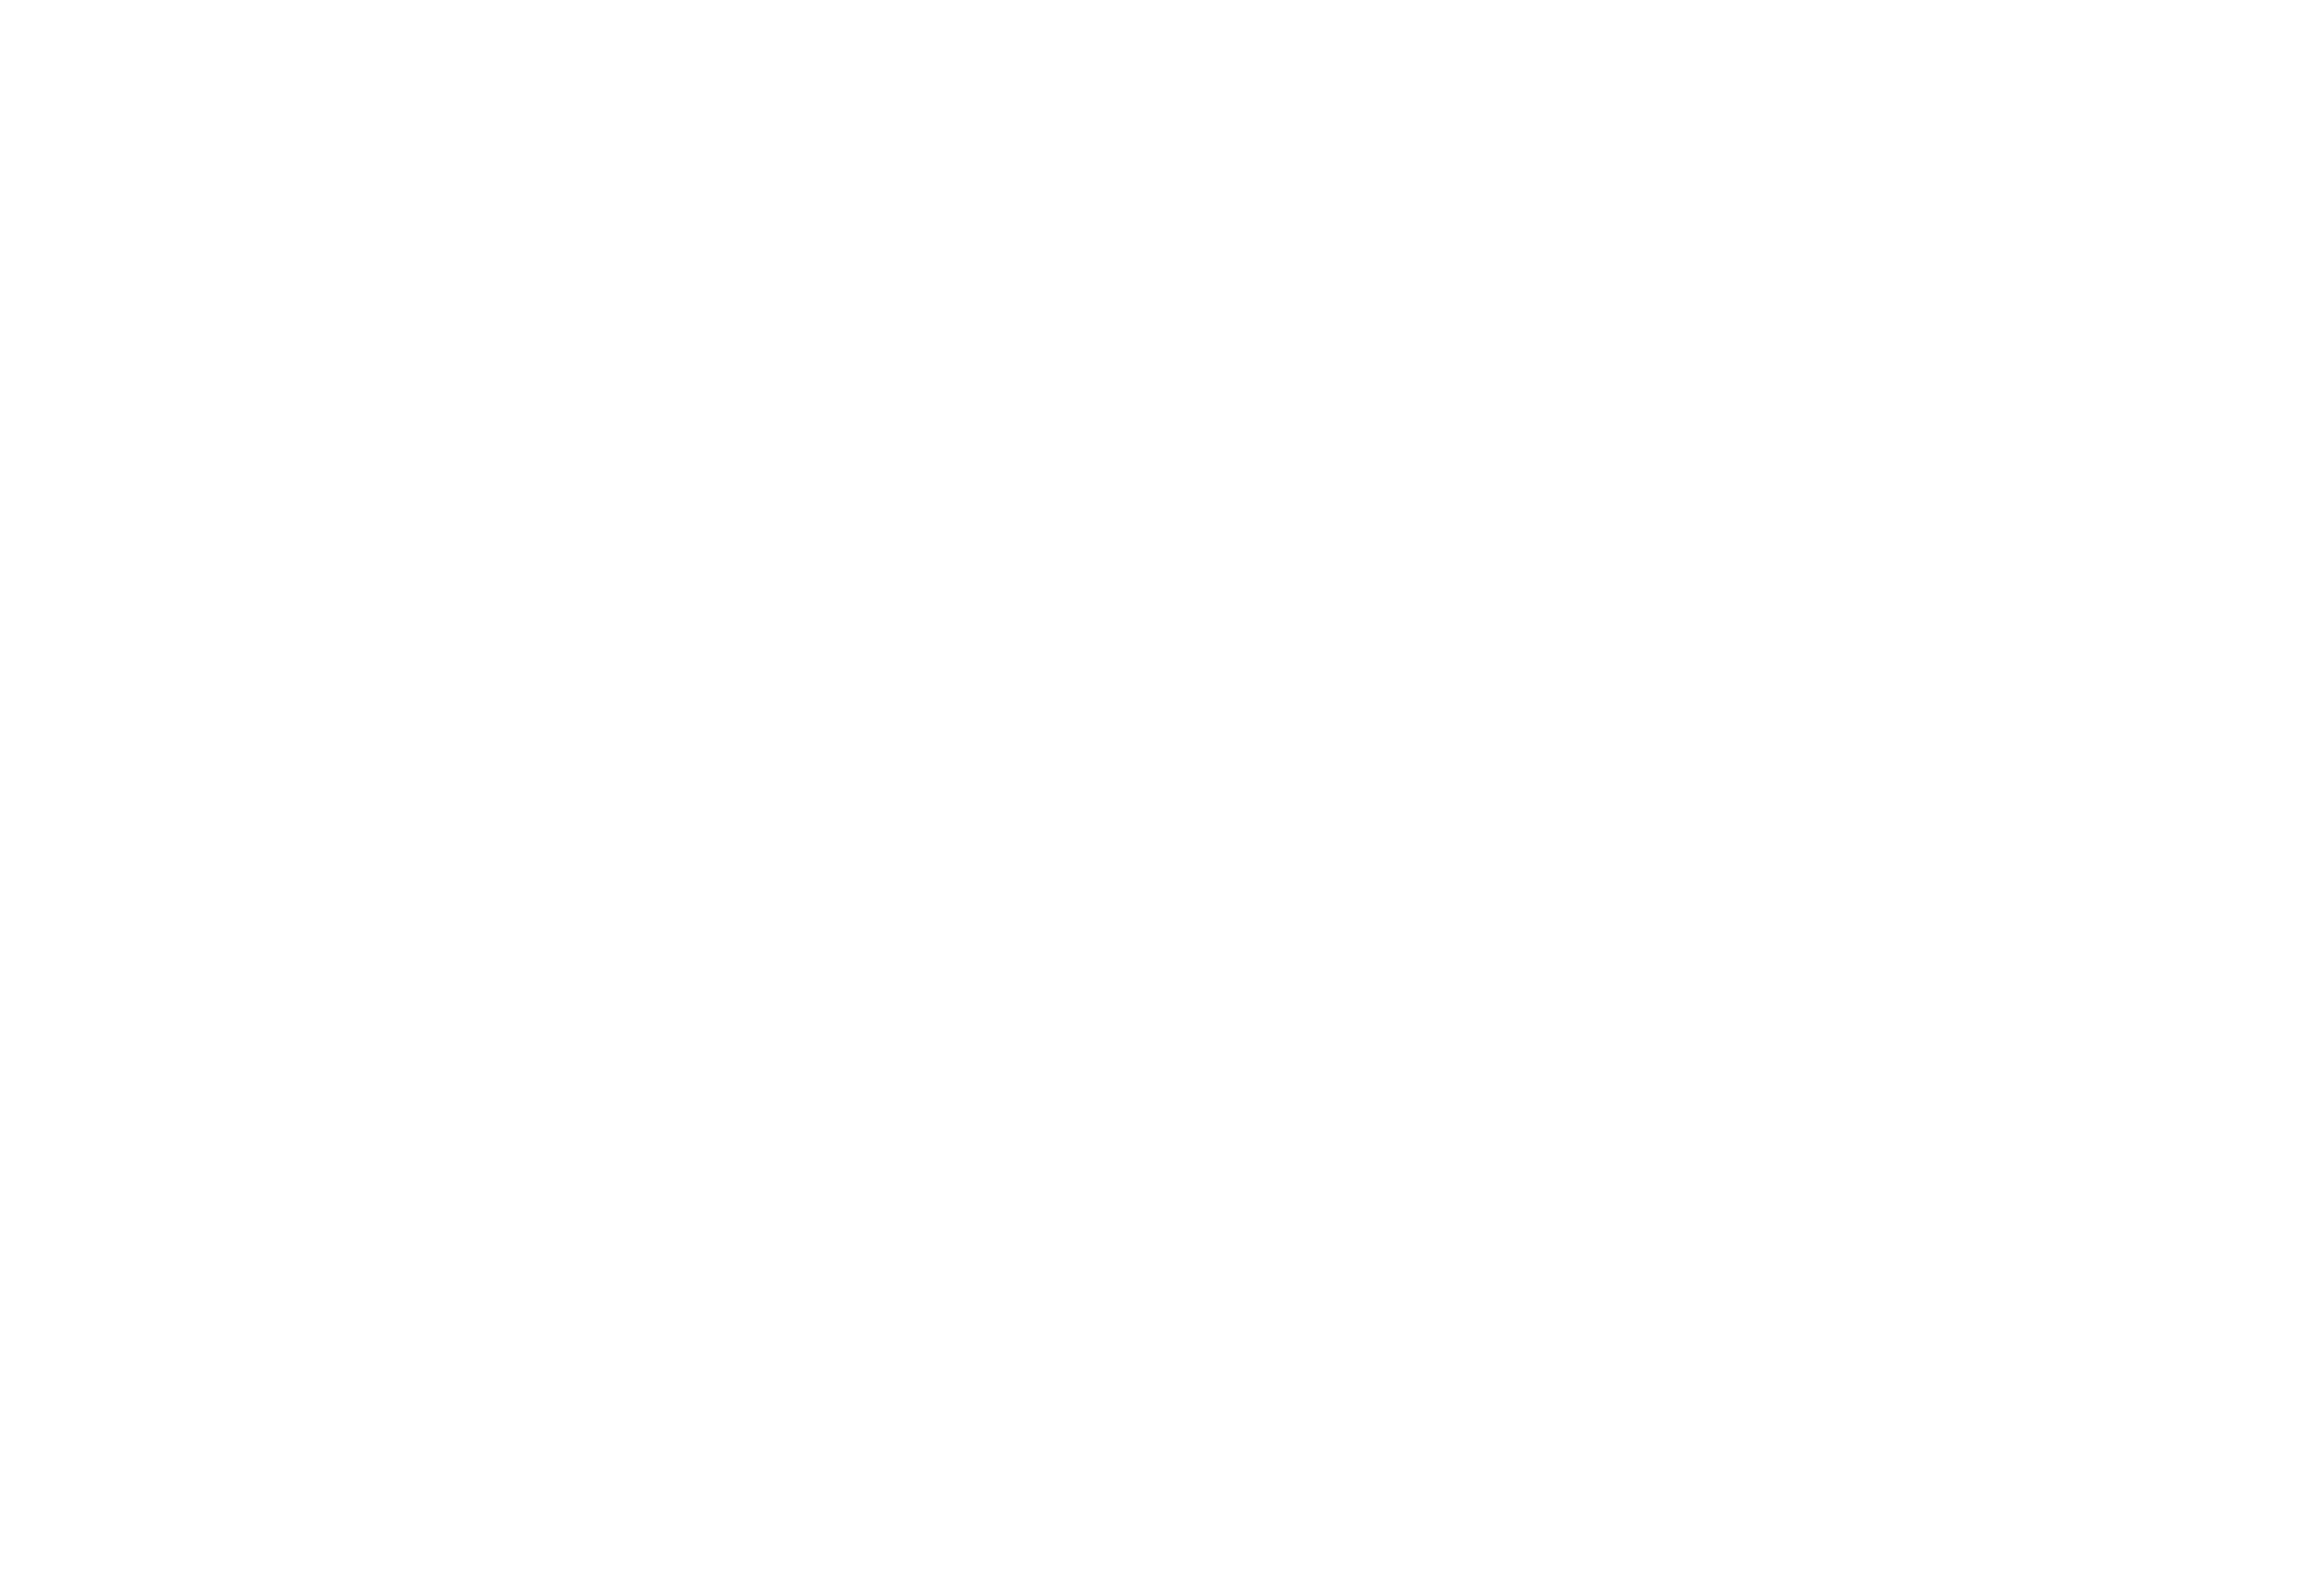 Encompass Engineering footer